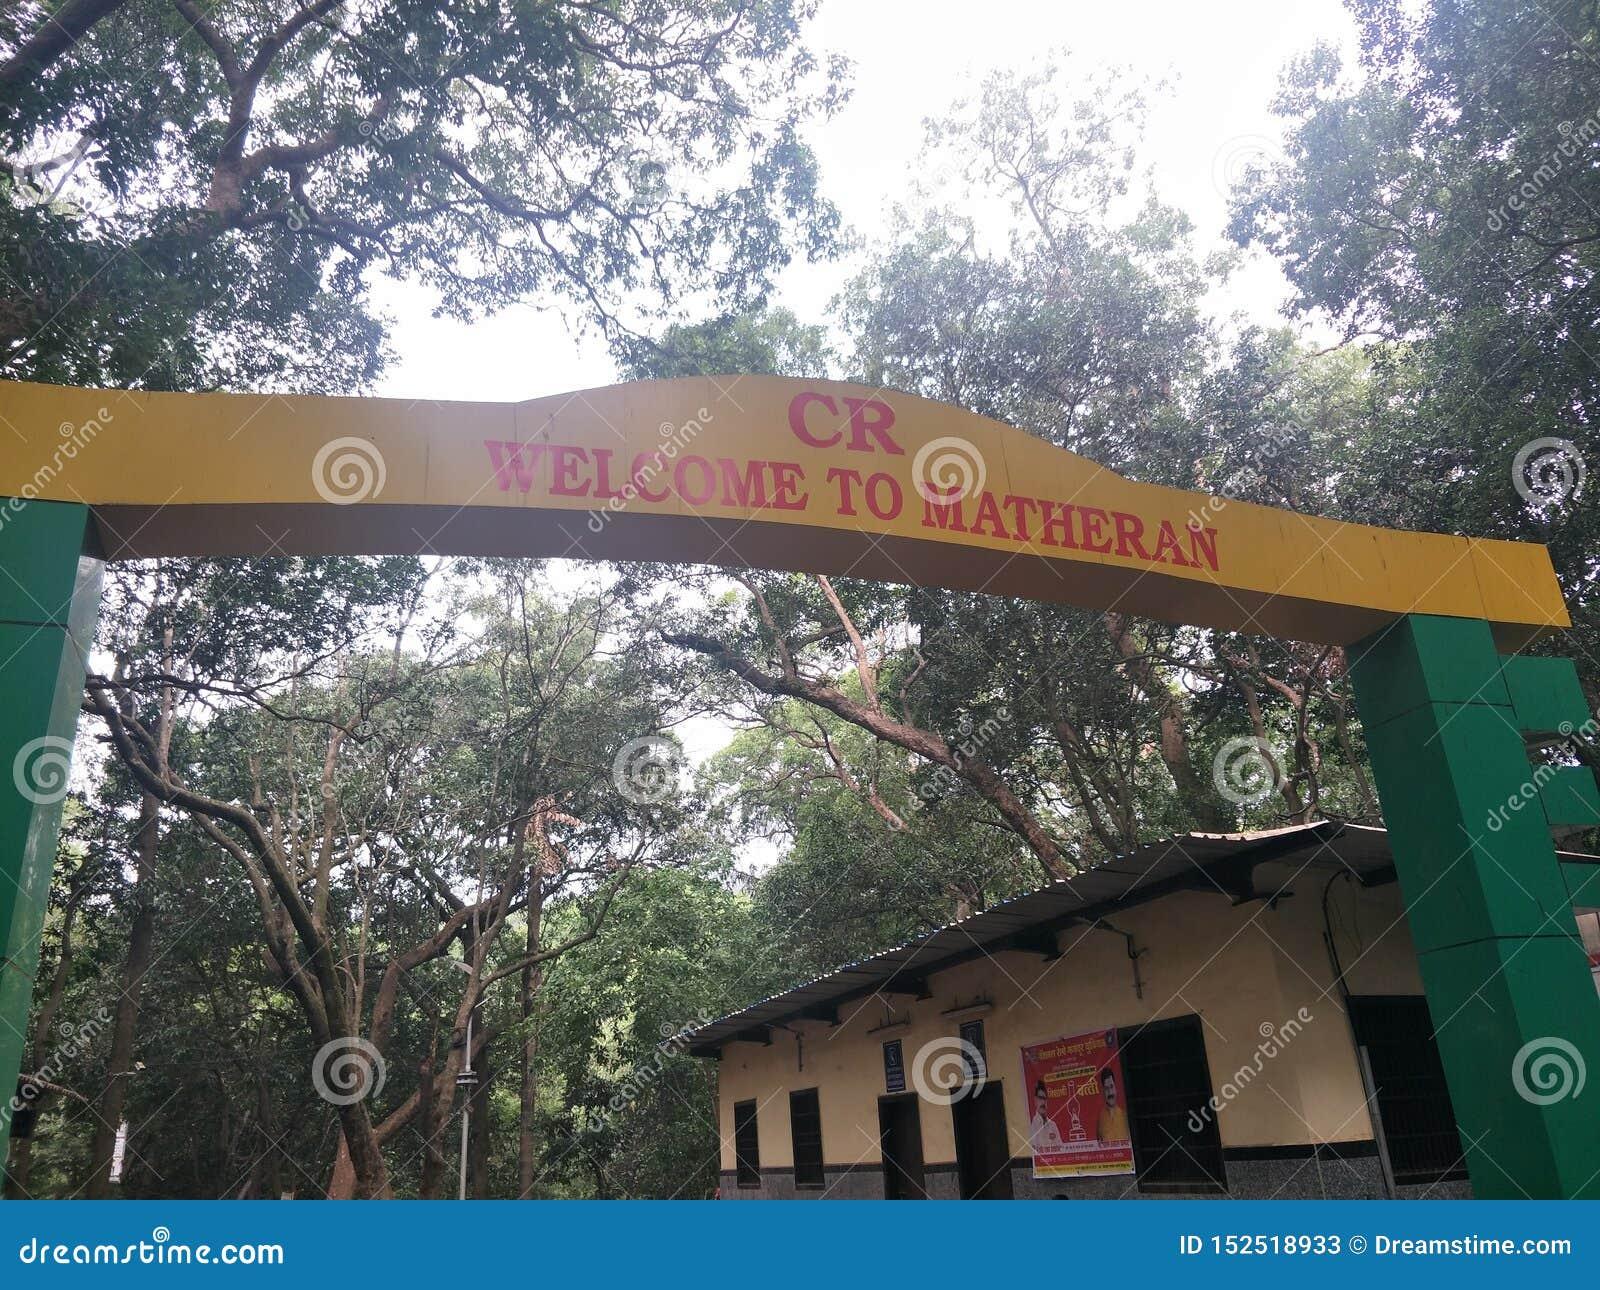 Welcome to Matheran Gate, Mumbai, India